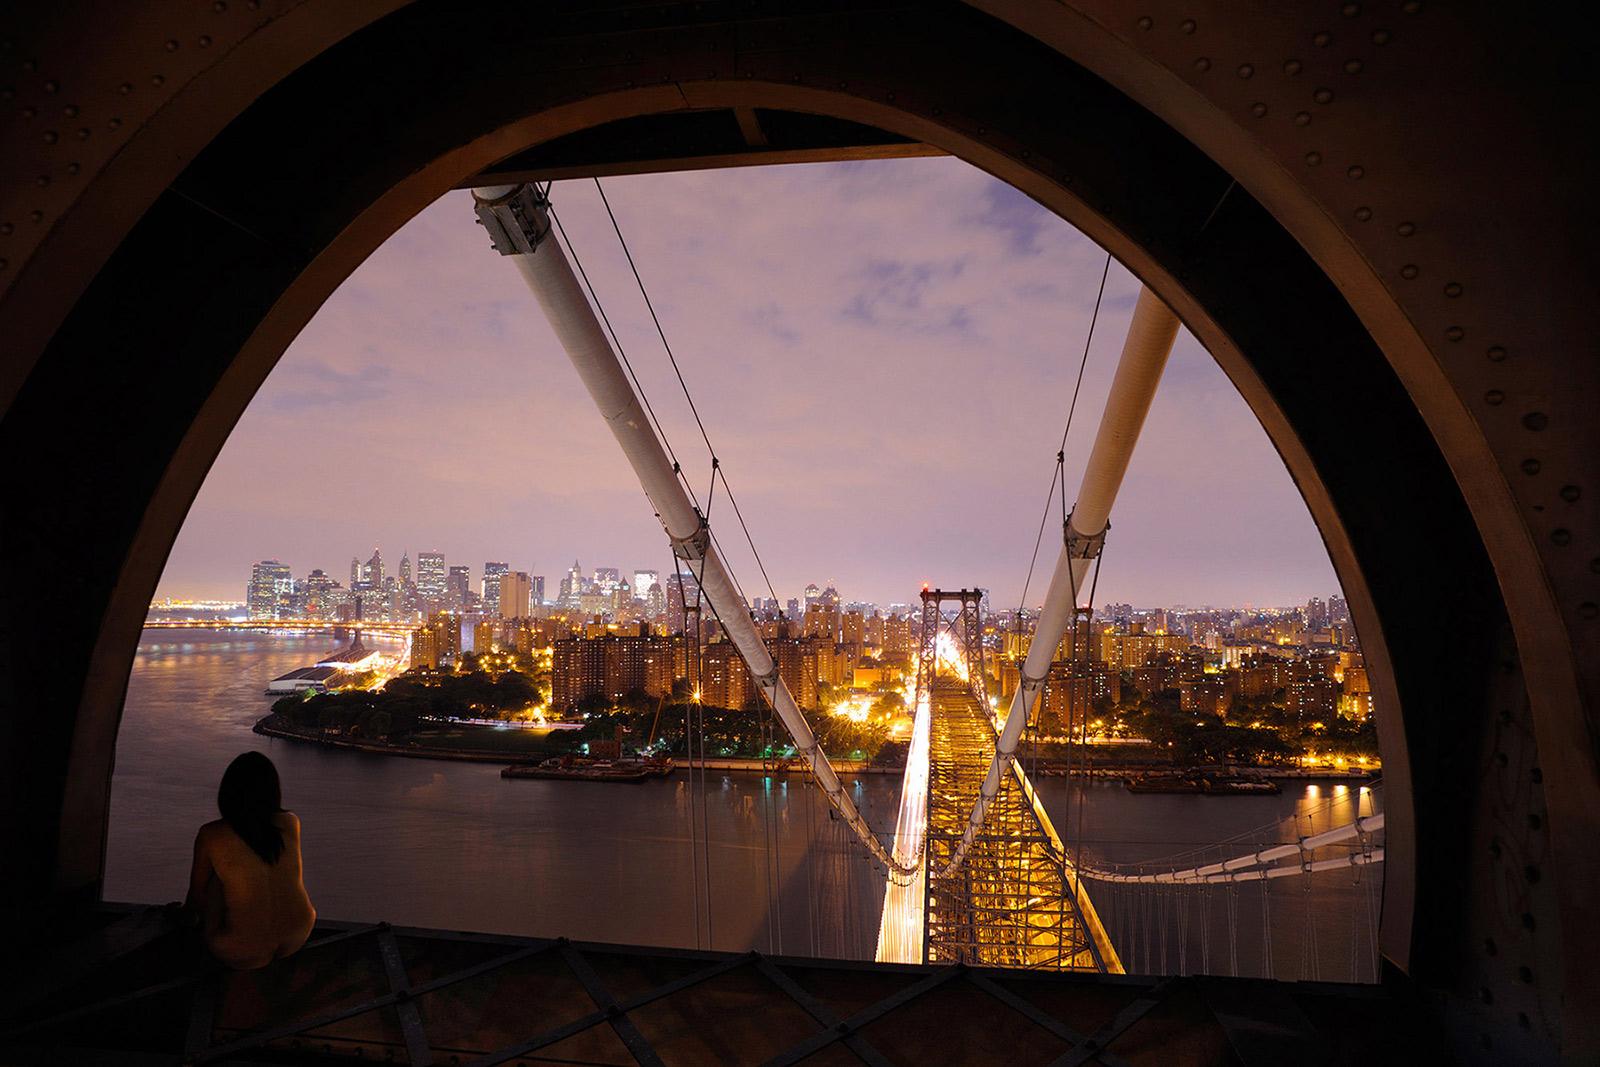 Williamsburg Bridge, New York, NY, USA